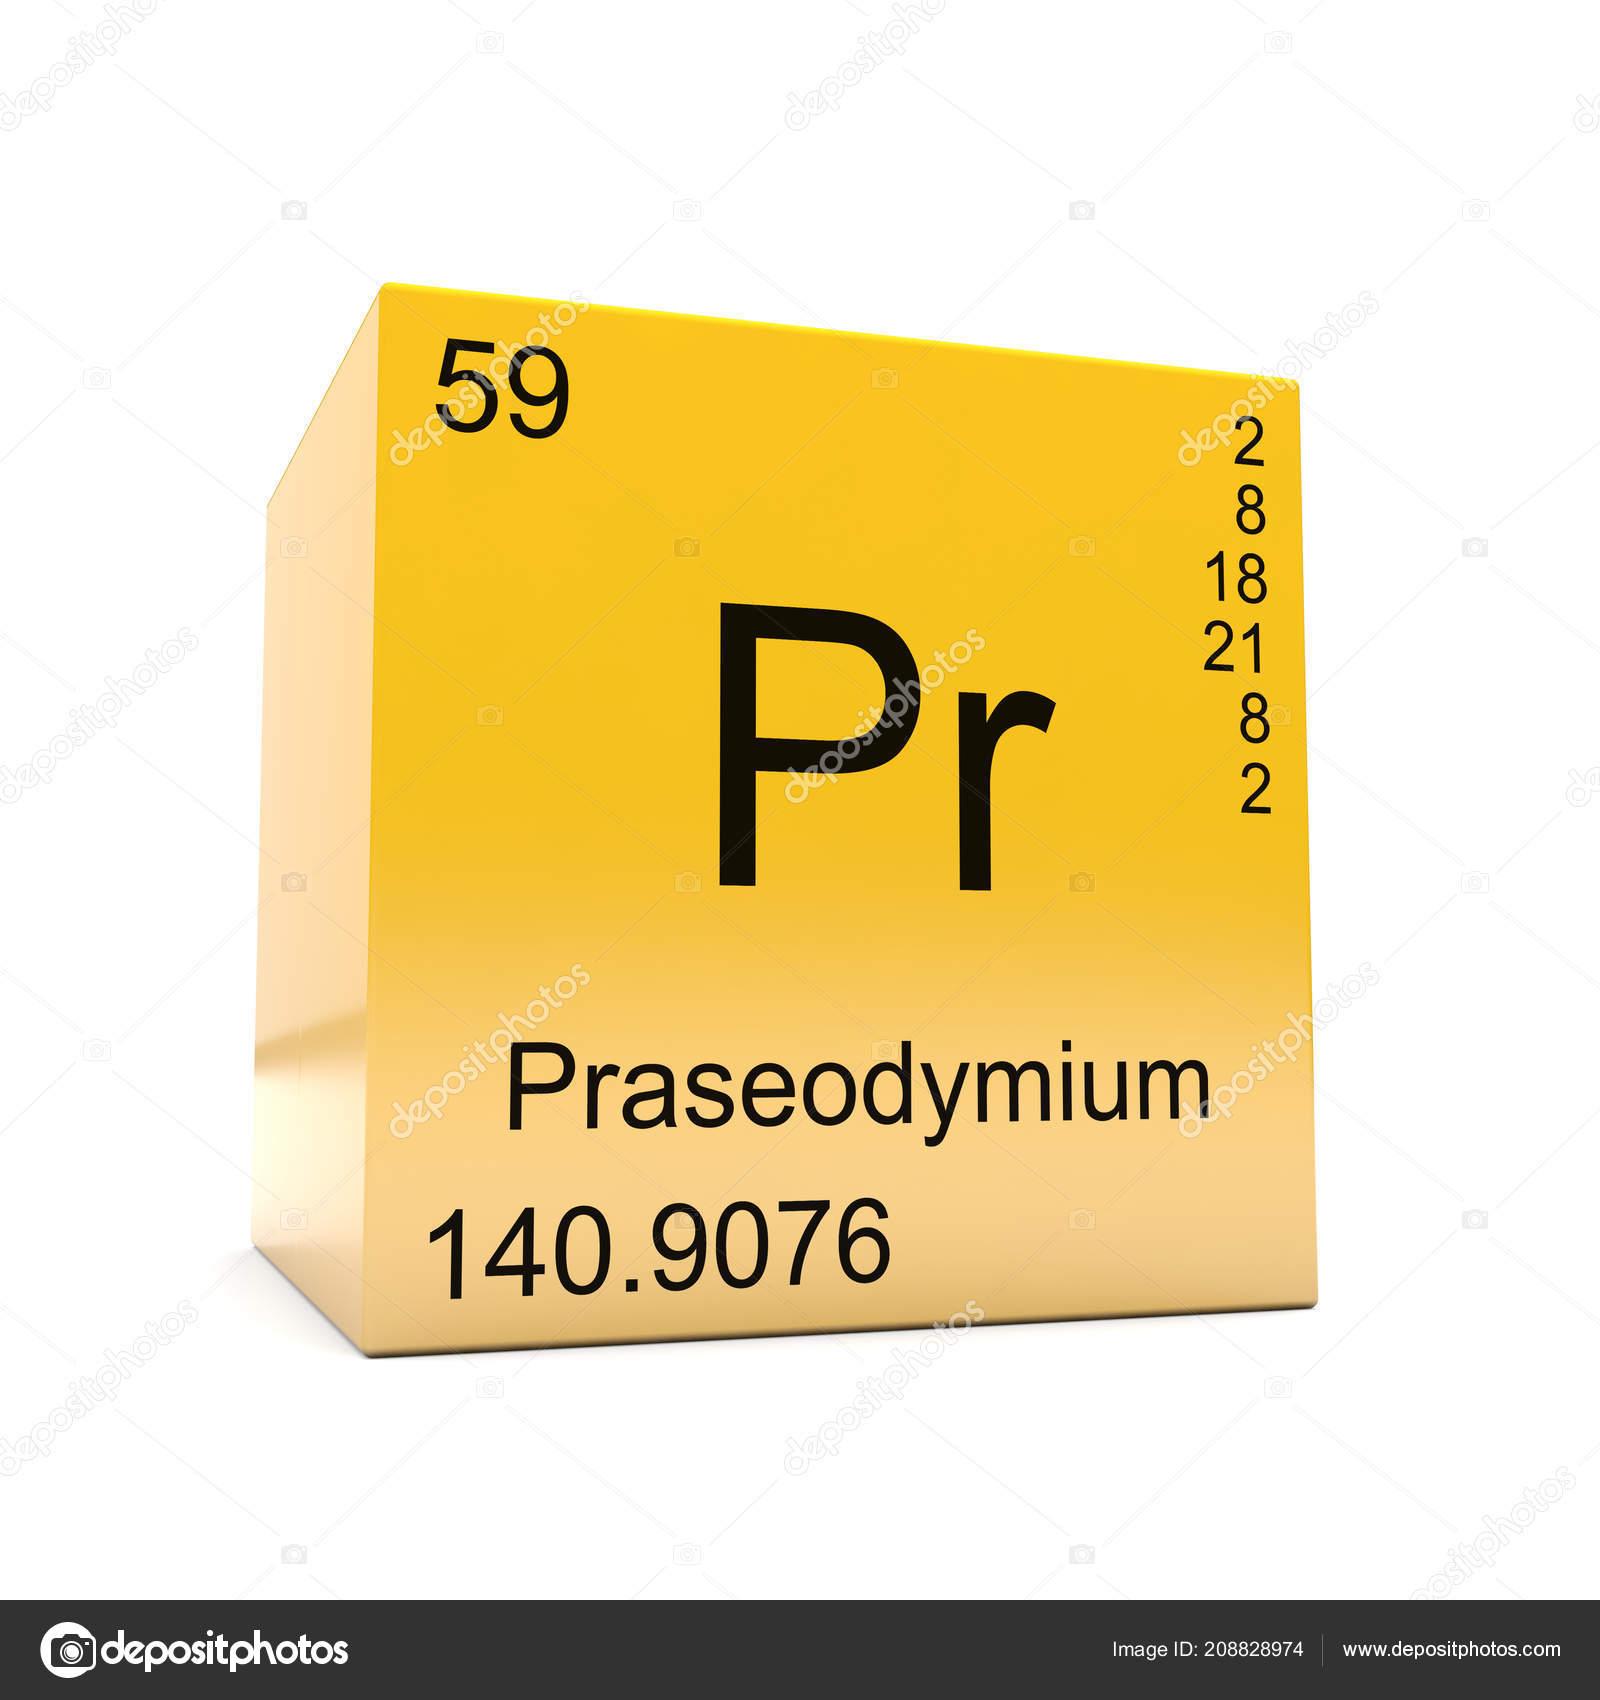 Praseodymium Chemical Element Symbol Periodic Table Displayed Glossy